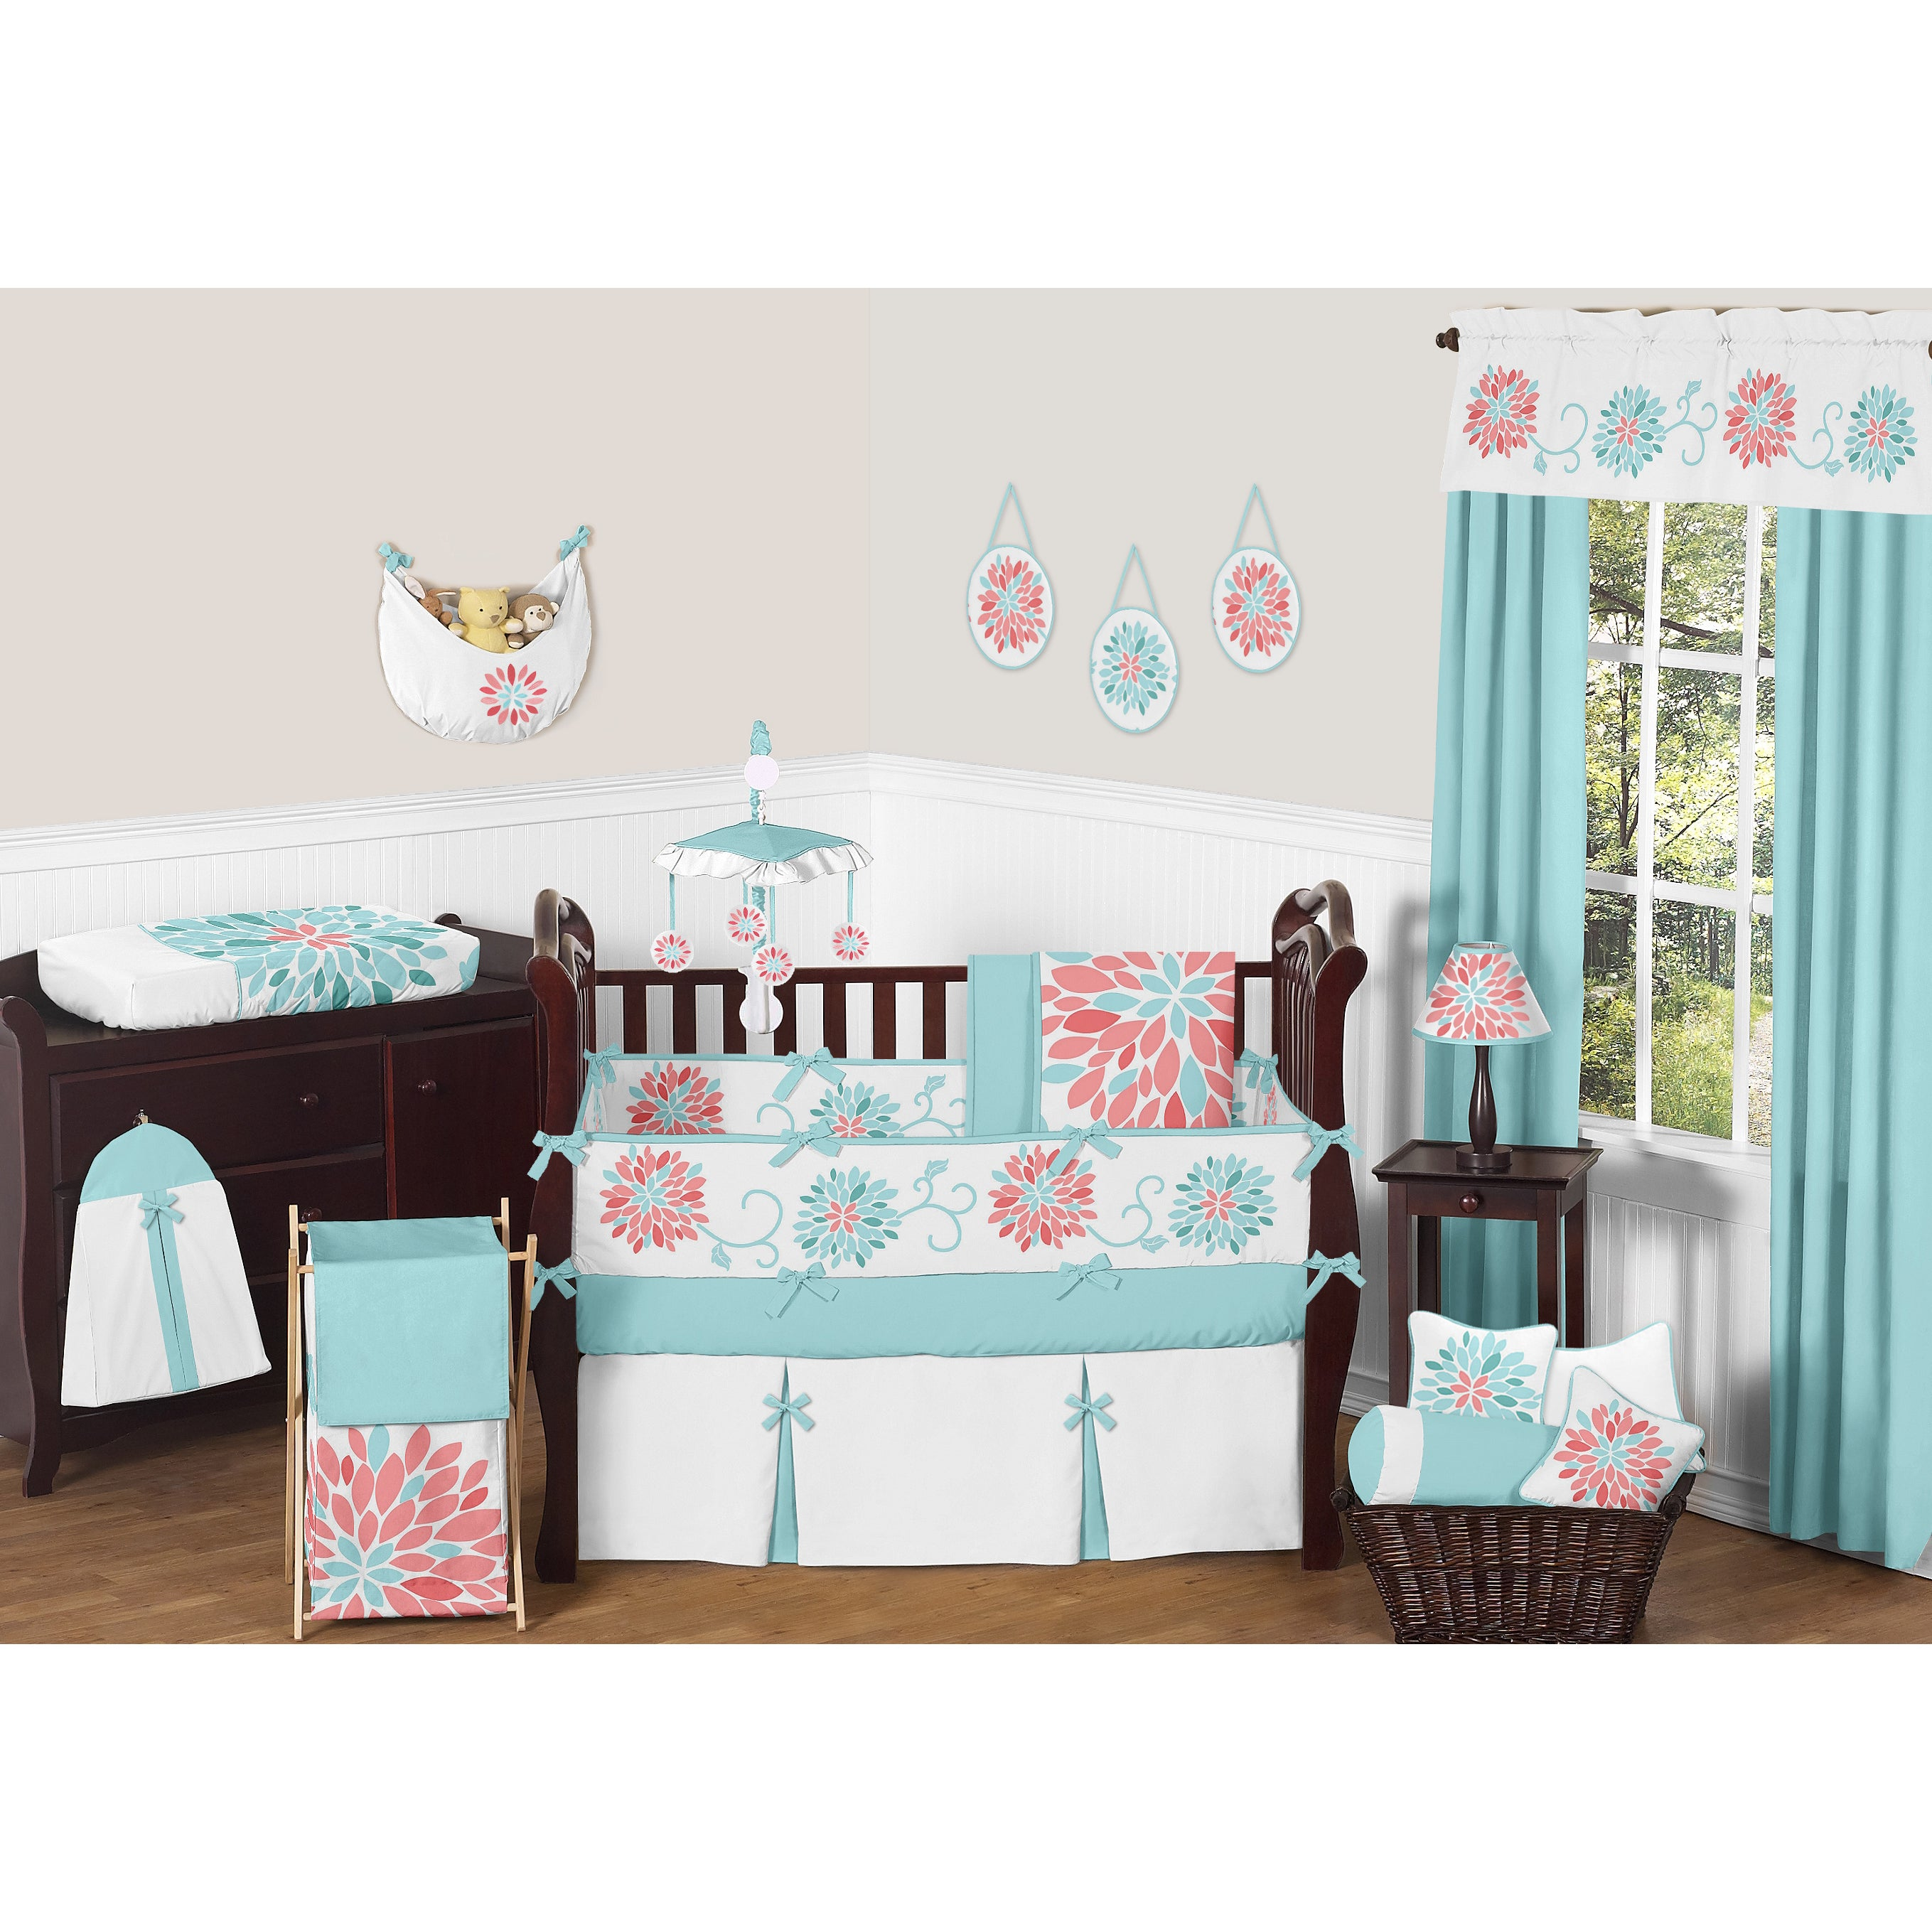 sweet safari baby ebay designs cot collection cribs crib print images pcs nojo zoo animal jungle frightening nursery set boutique jojo bedding animalib sets stupendous bedroom